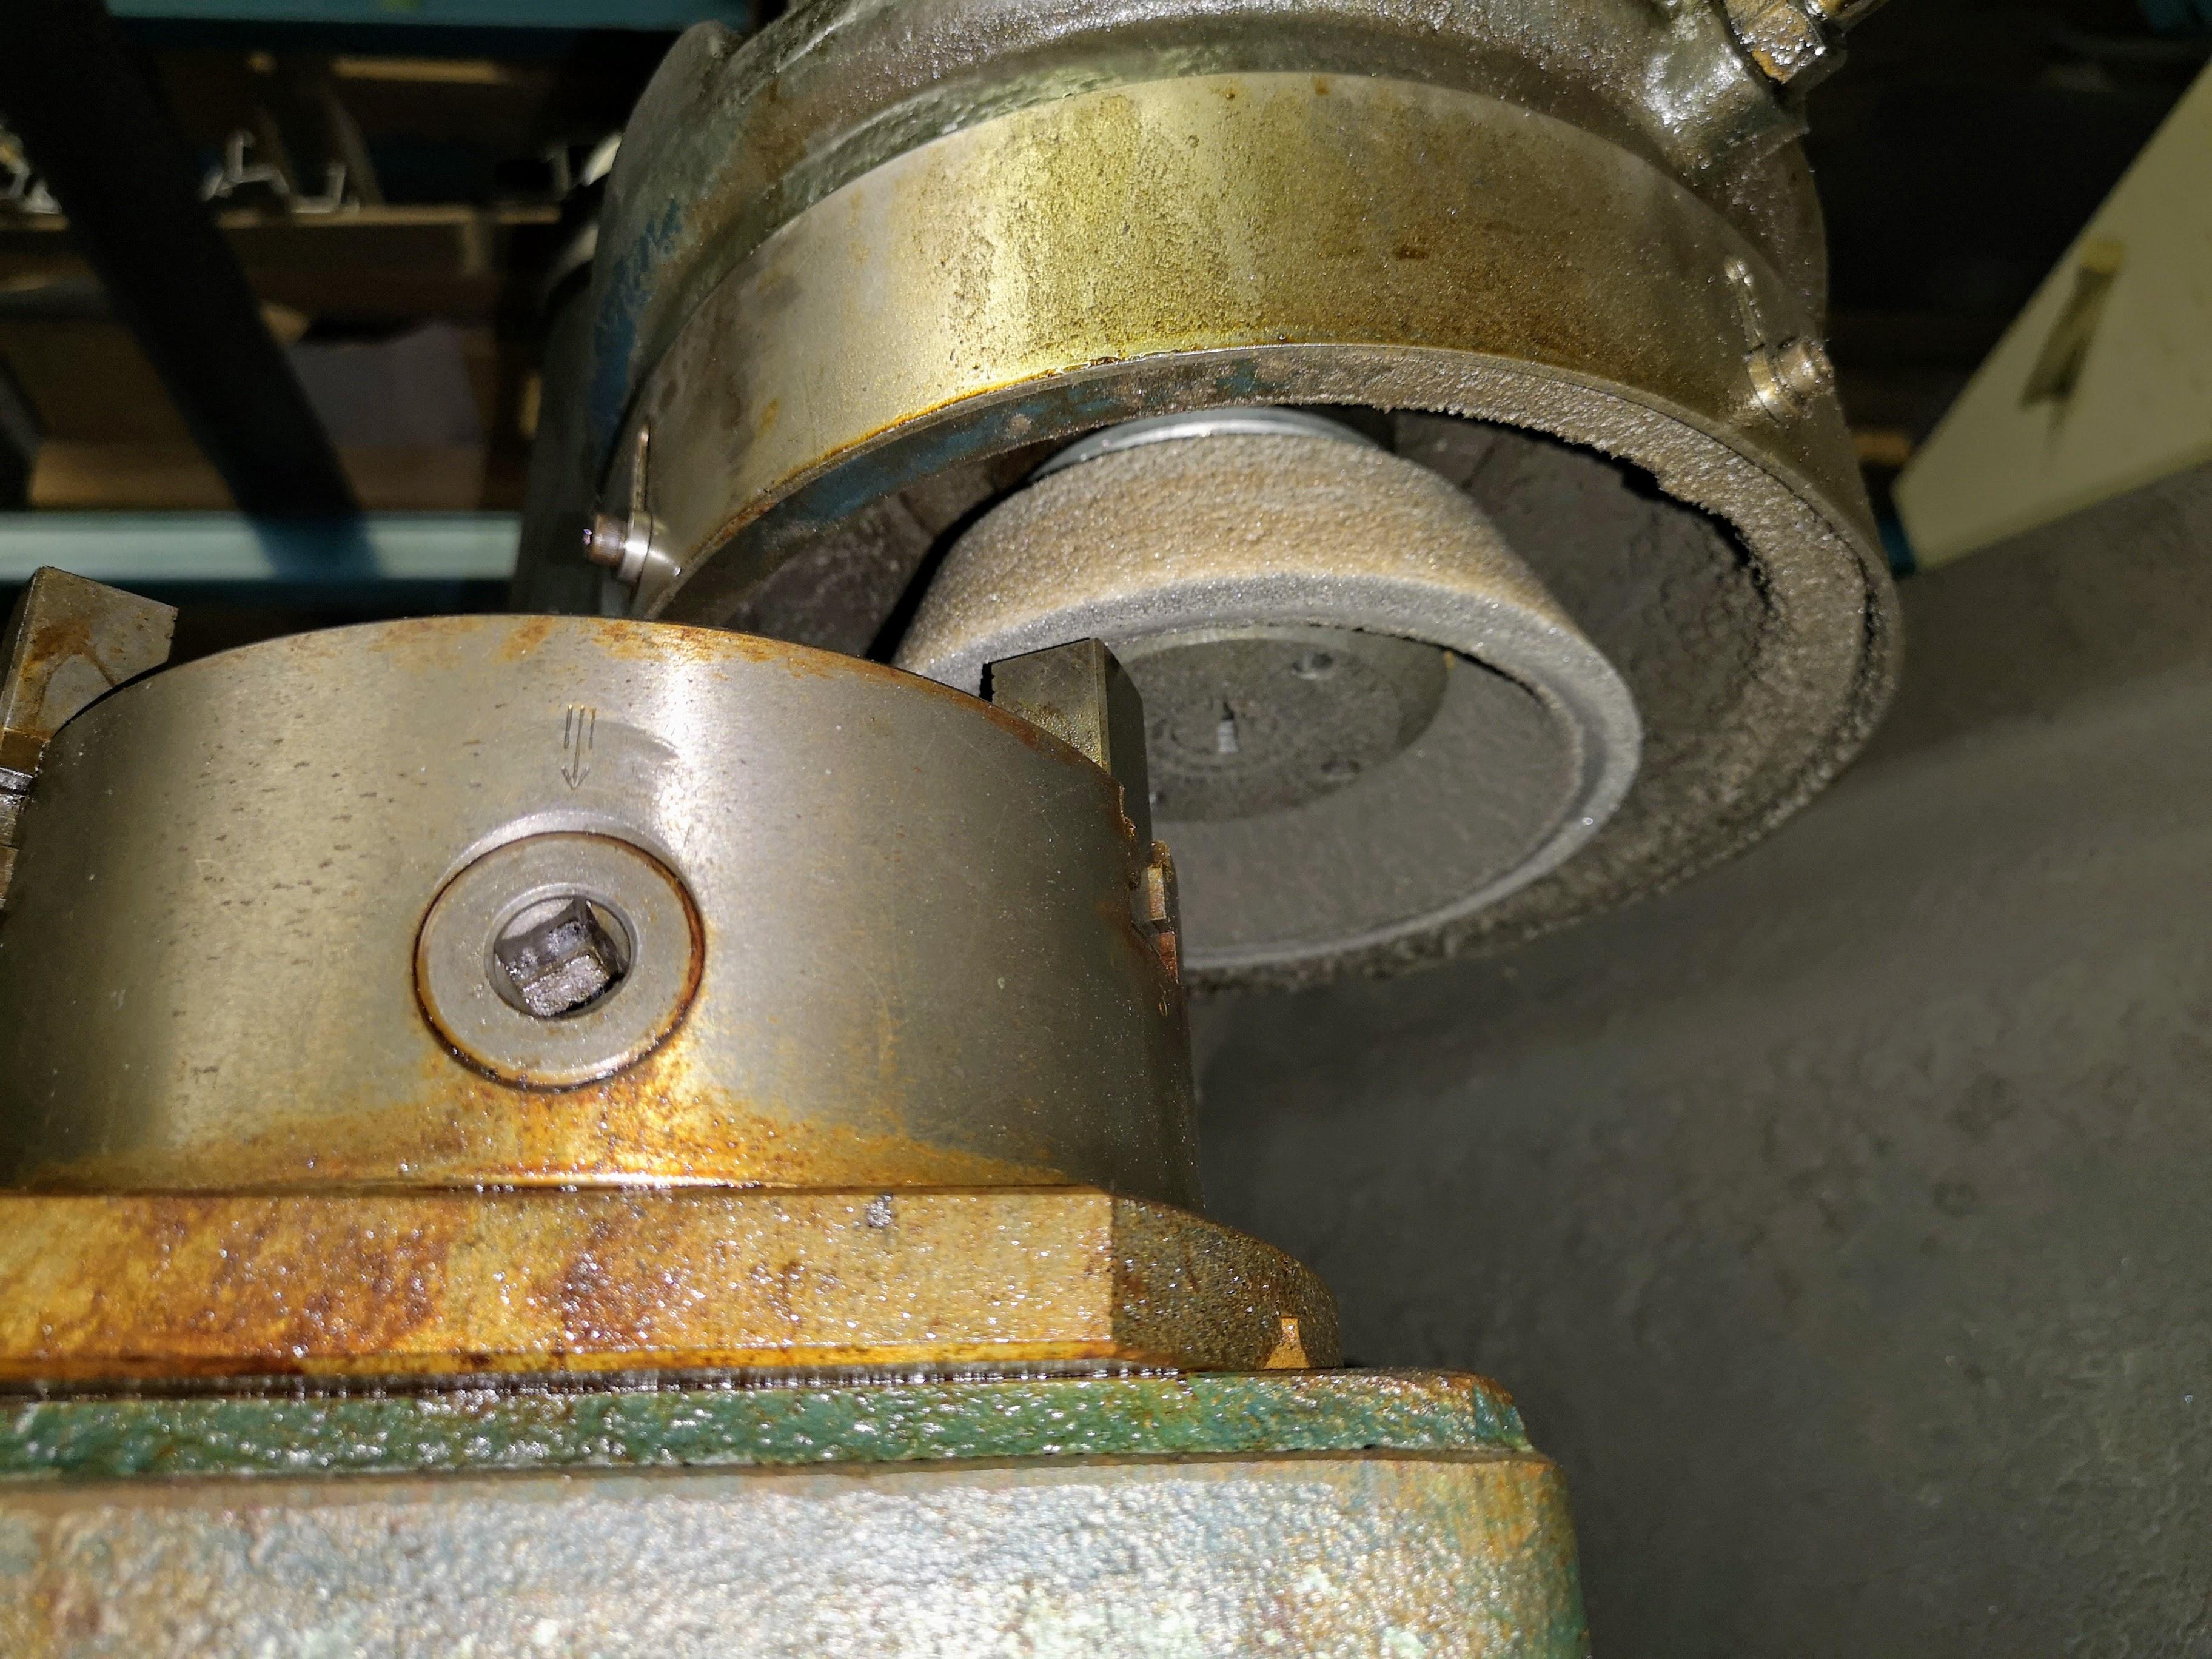 Lot 6 - AMADA TEG-160E PUNCH GRINDER, S/N HF 2421